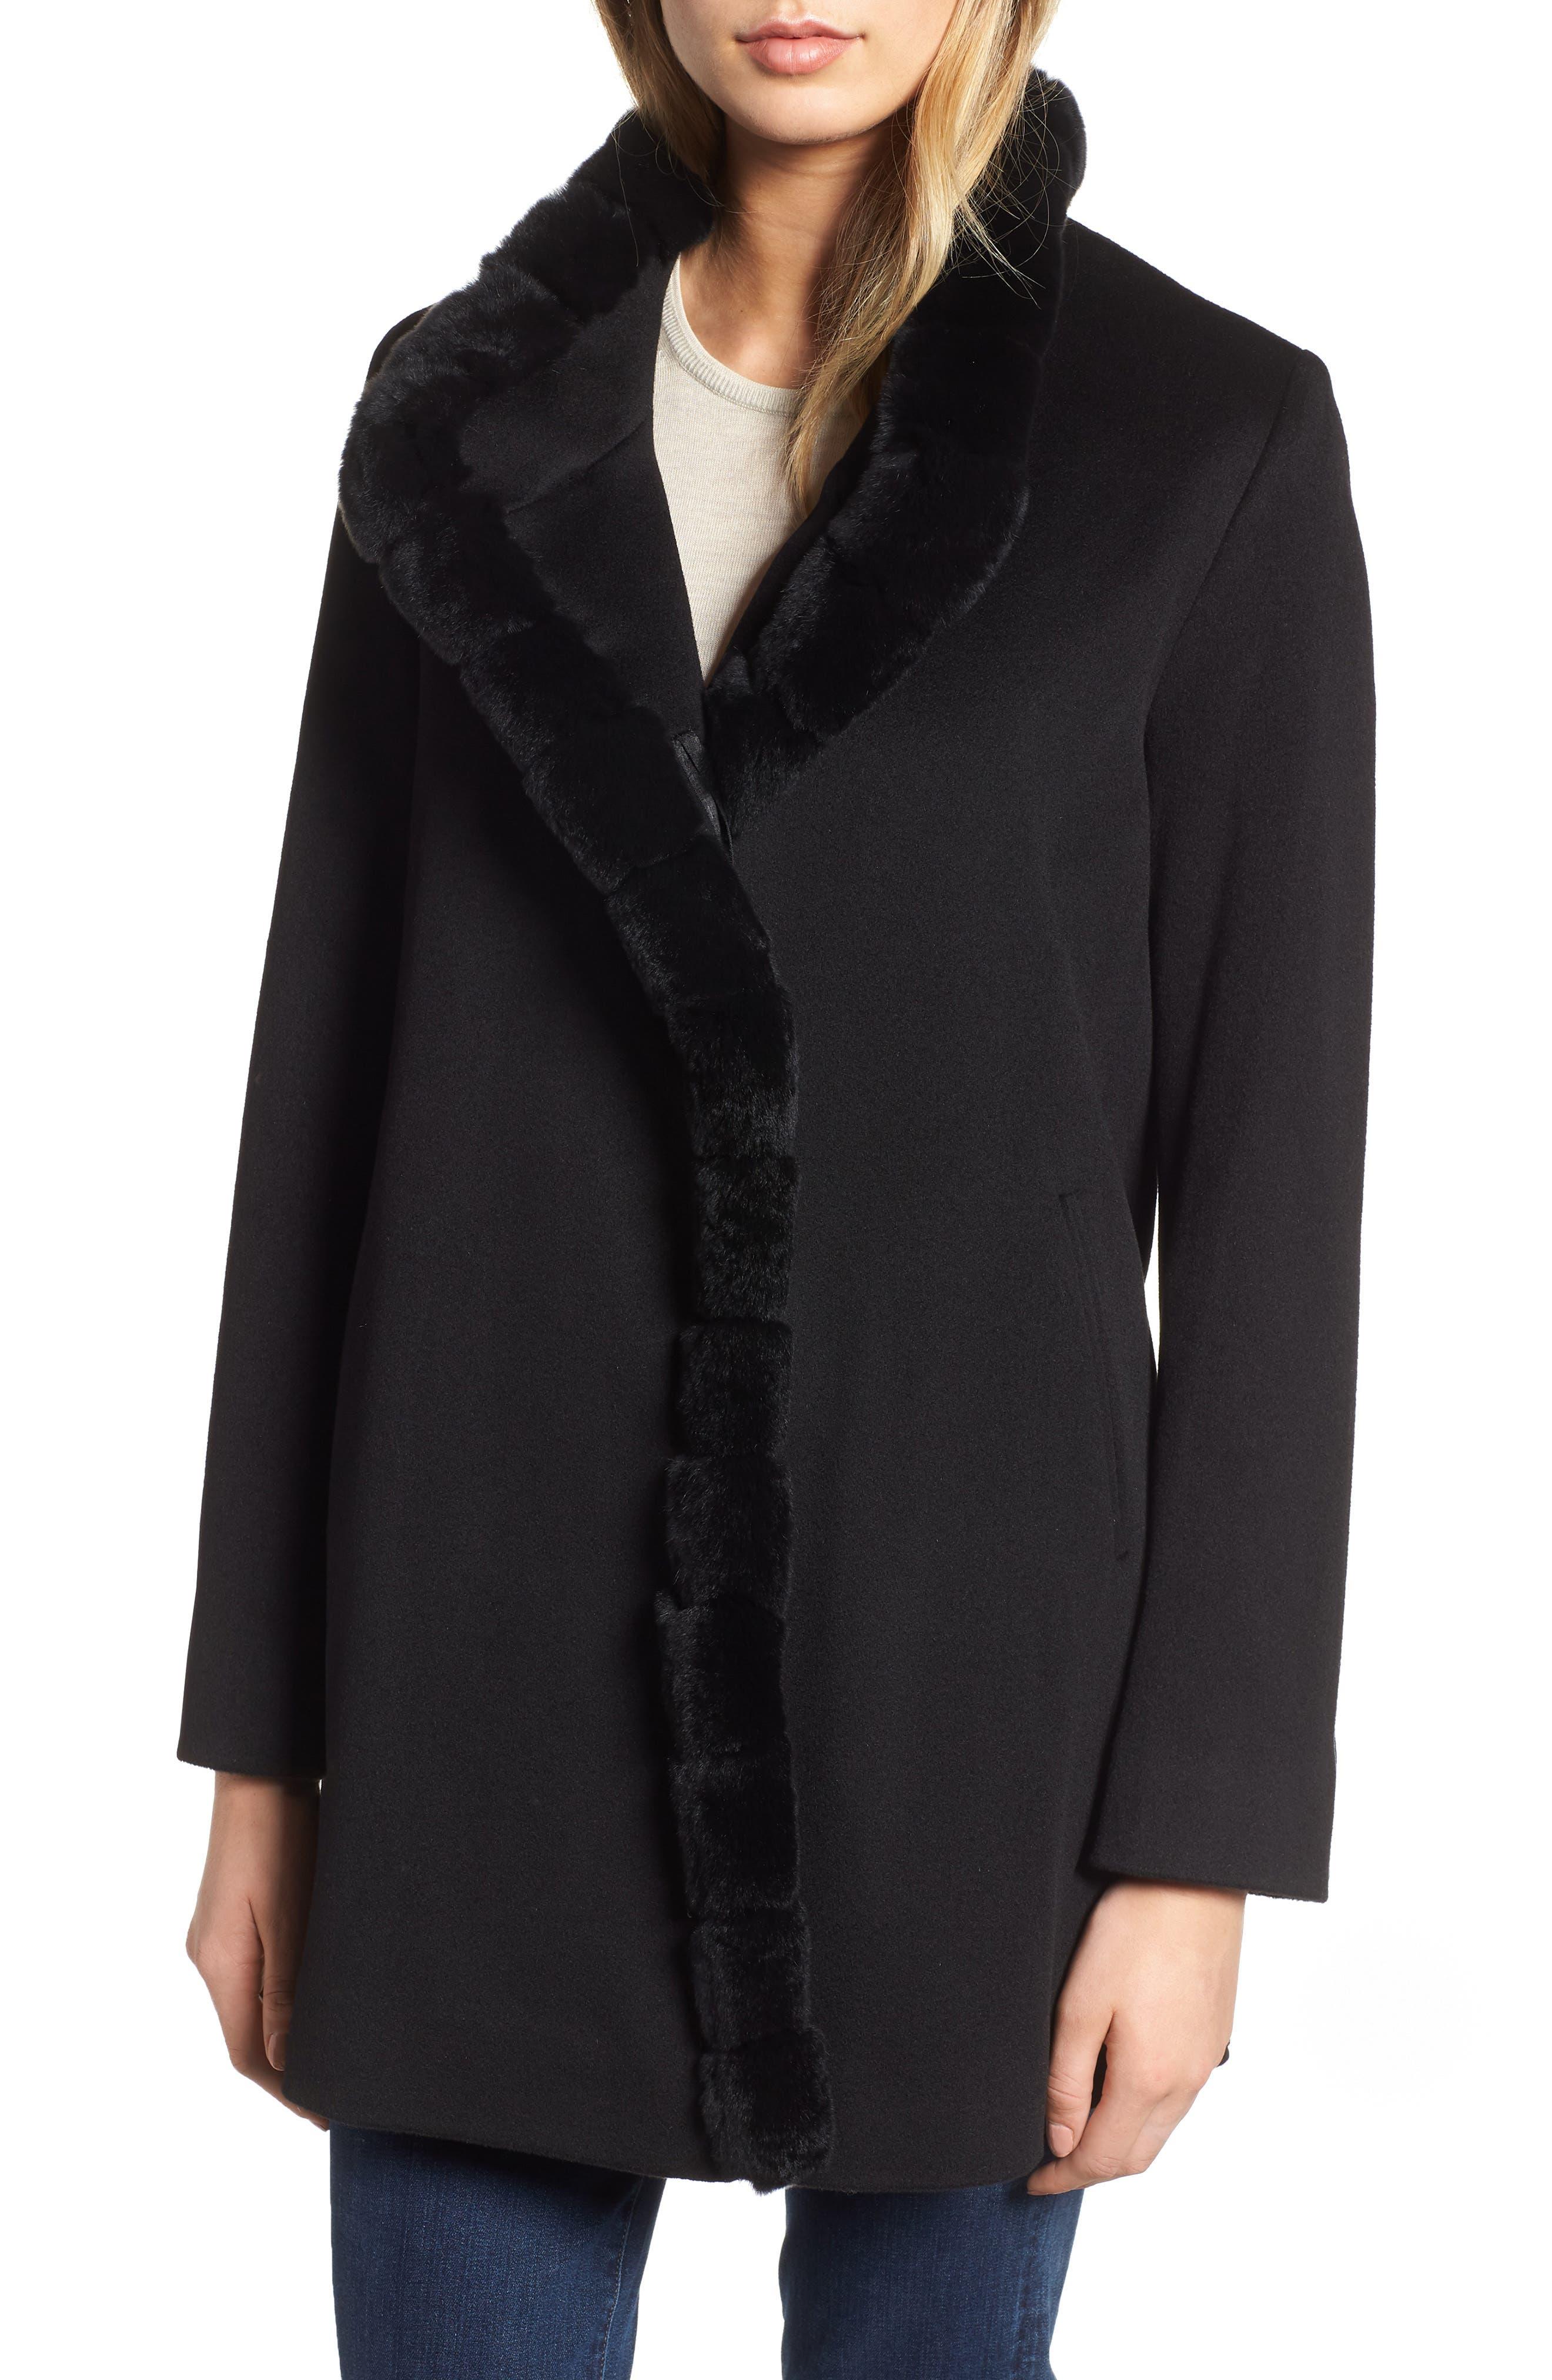 FLEURETTE,                             Loro Piana Wool Car Coat with Genuine Rex Rabbit Fur Trim,                             Main thumbnail 1, color,                             001